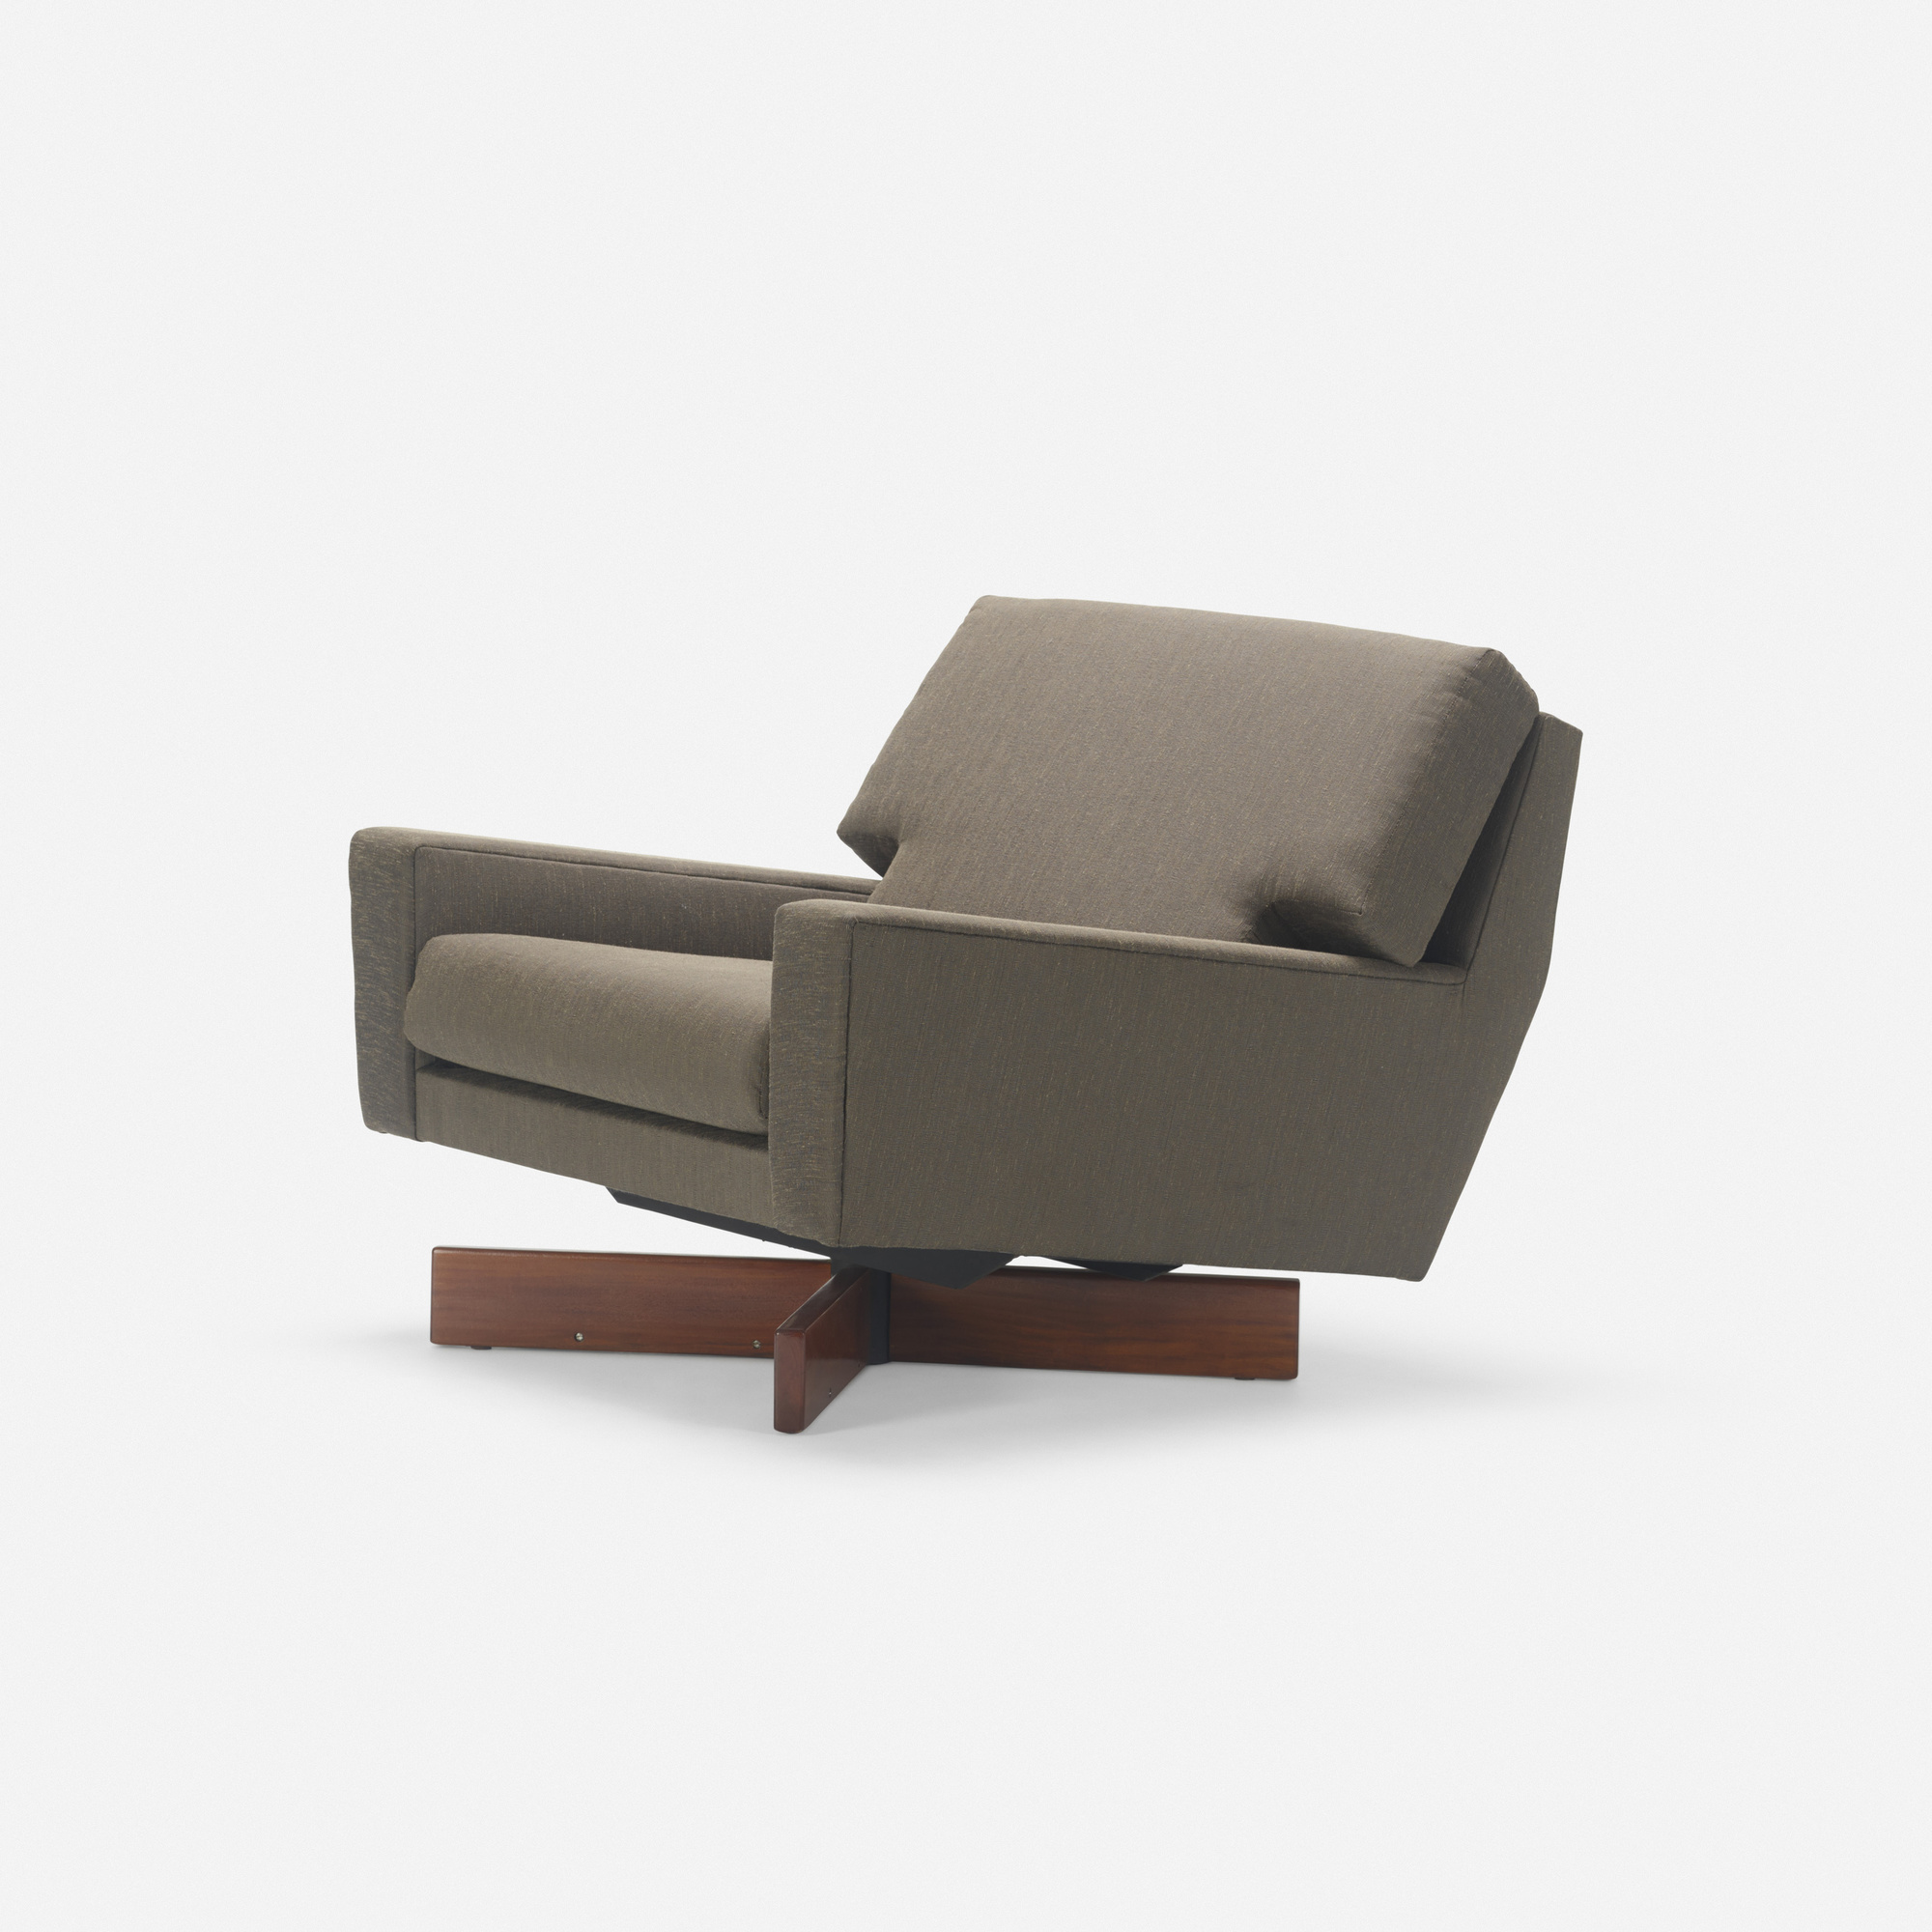 223: Jorge Zalszupin / lounge chair (1 of 3)